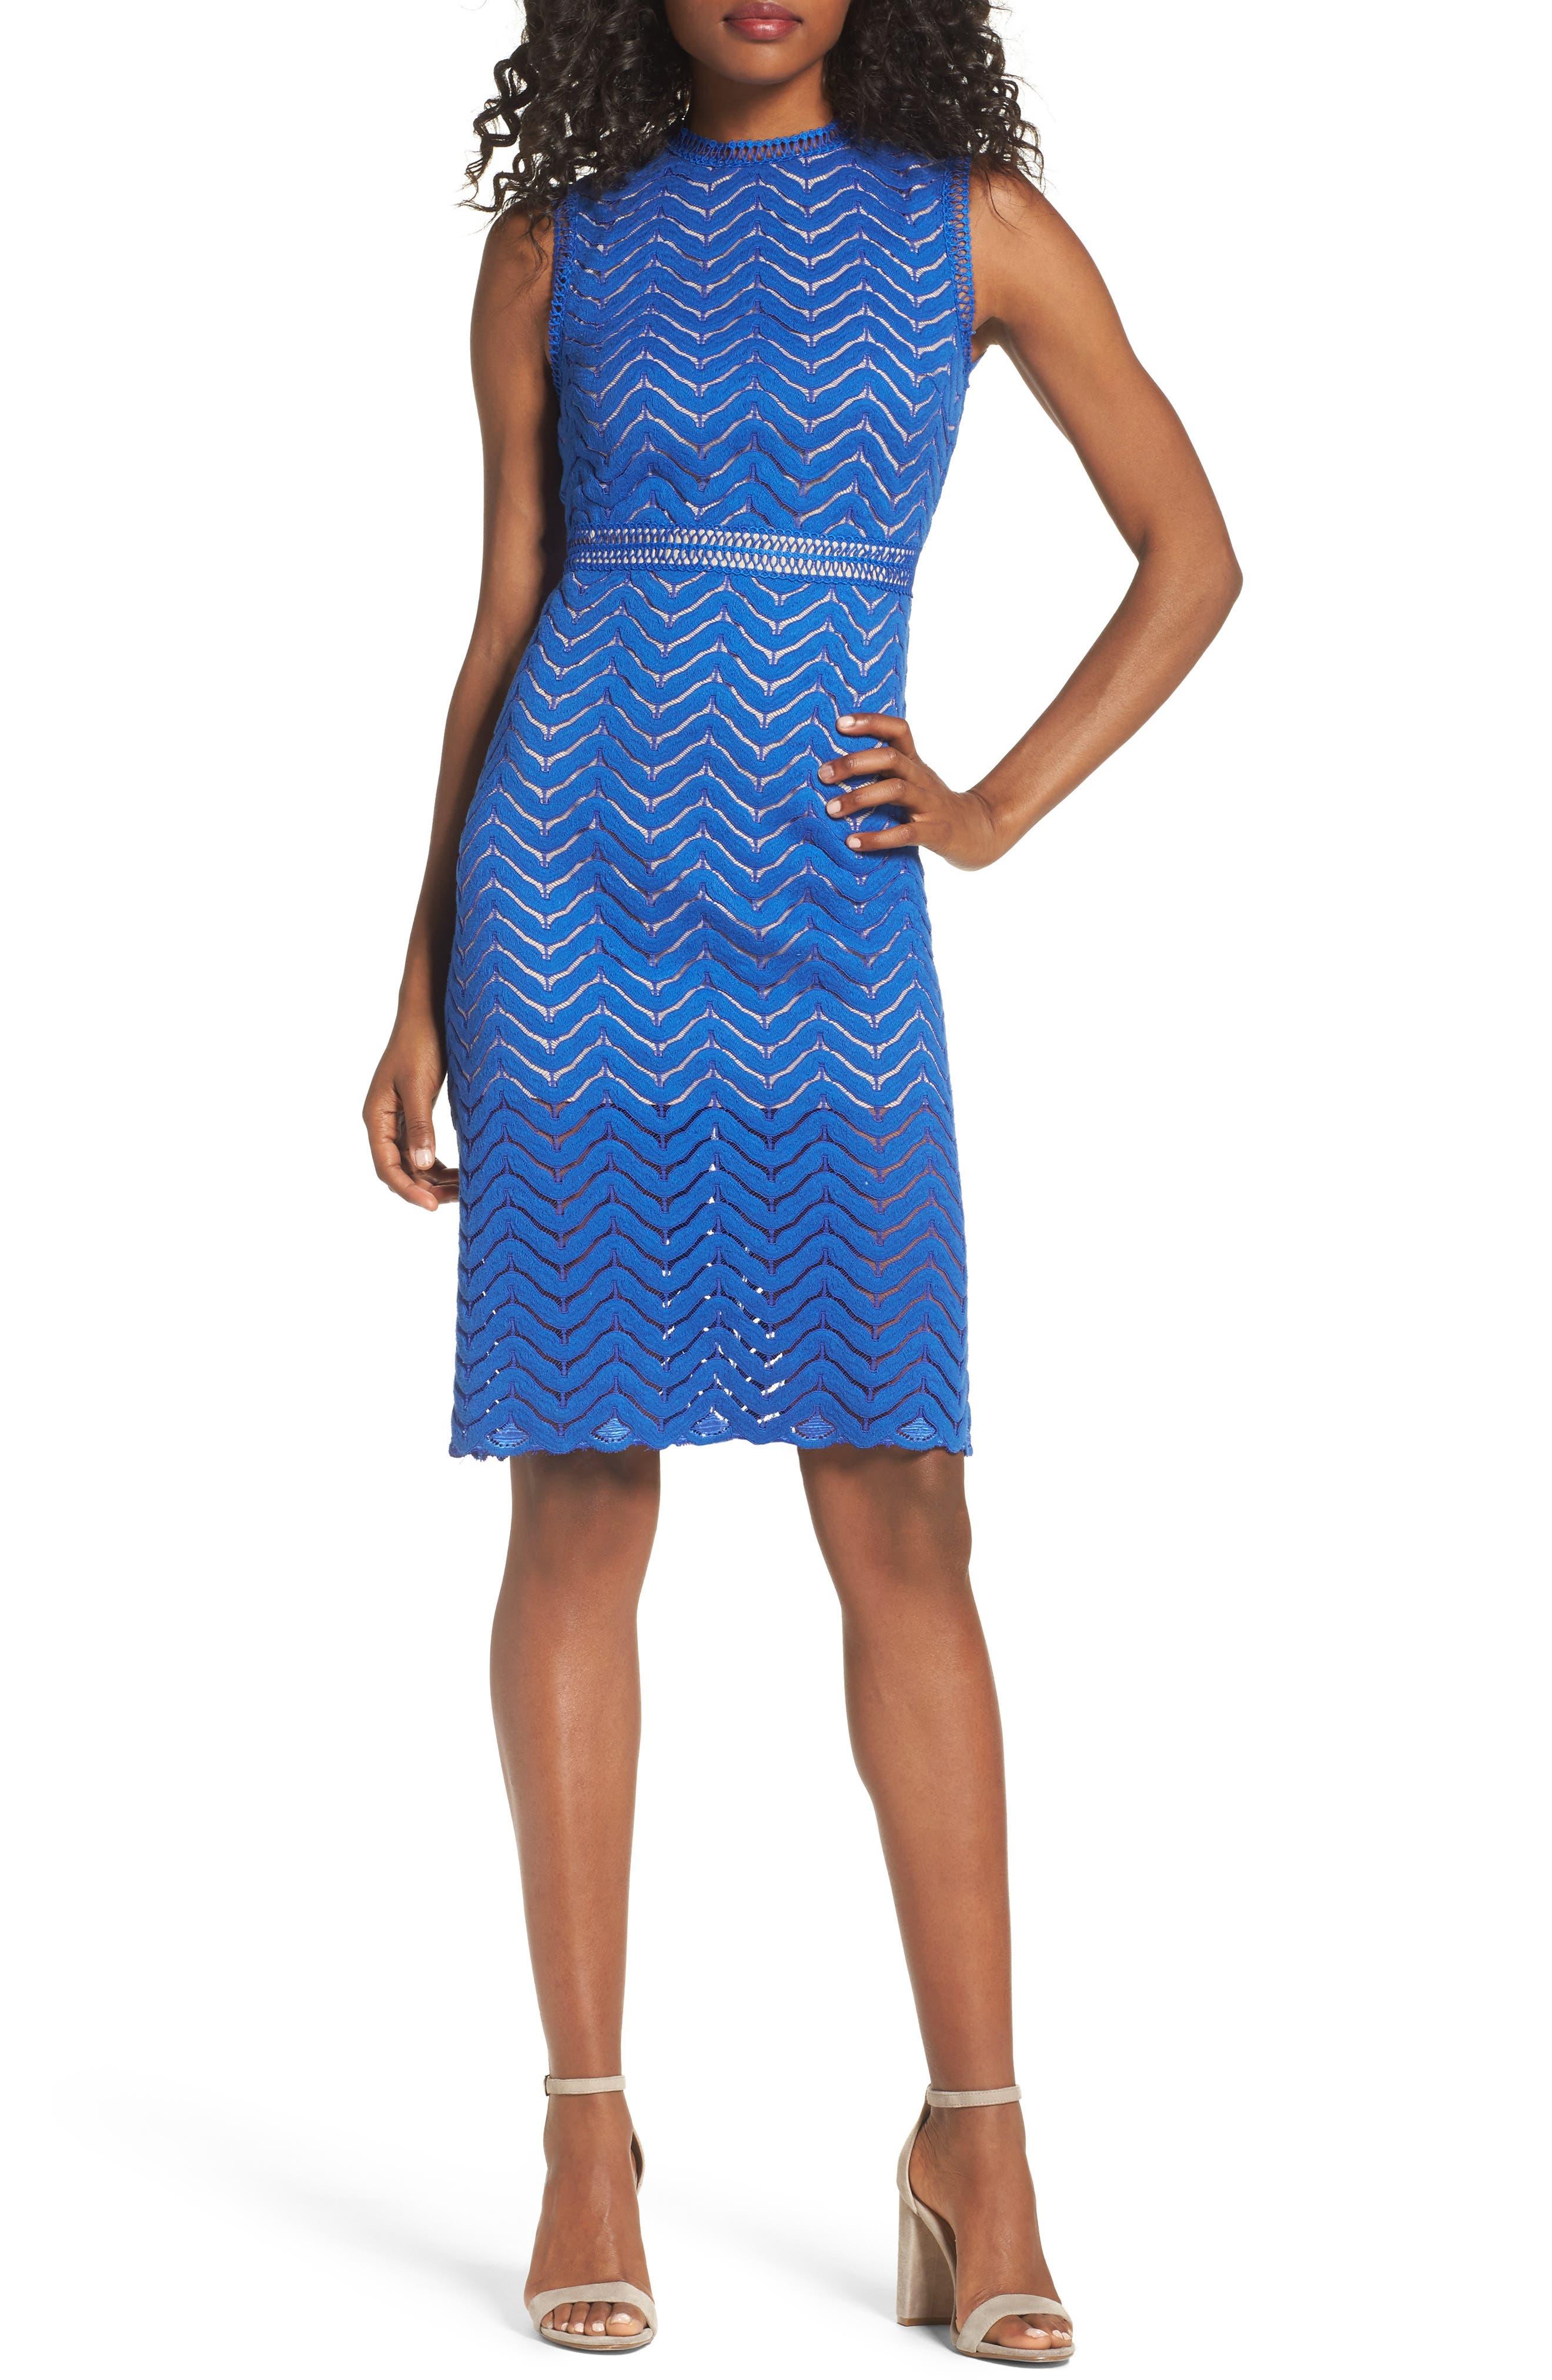 Alternate Image 1 Selected - Chelsea28 Lace Sheath Dress